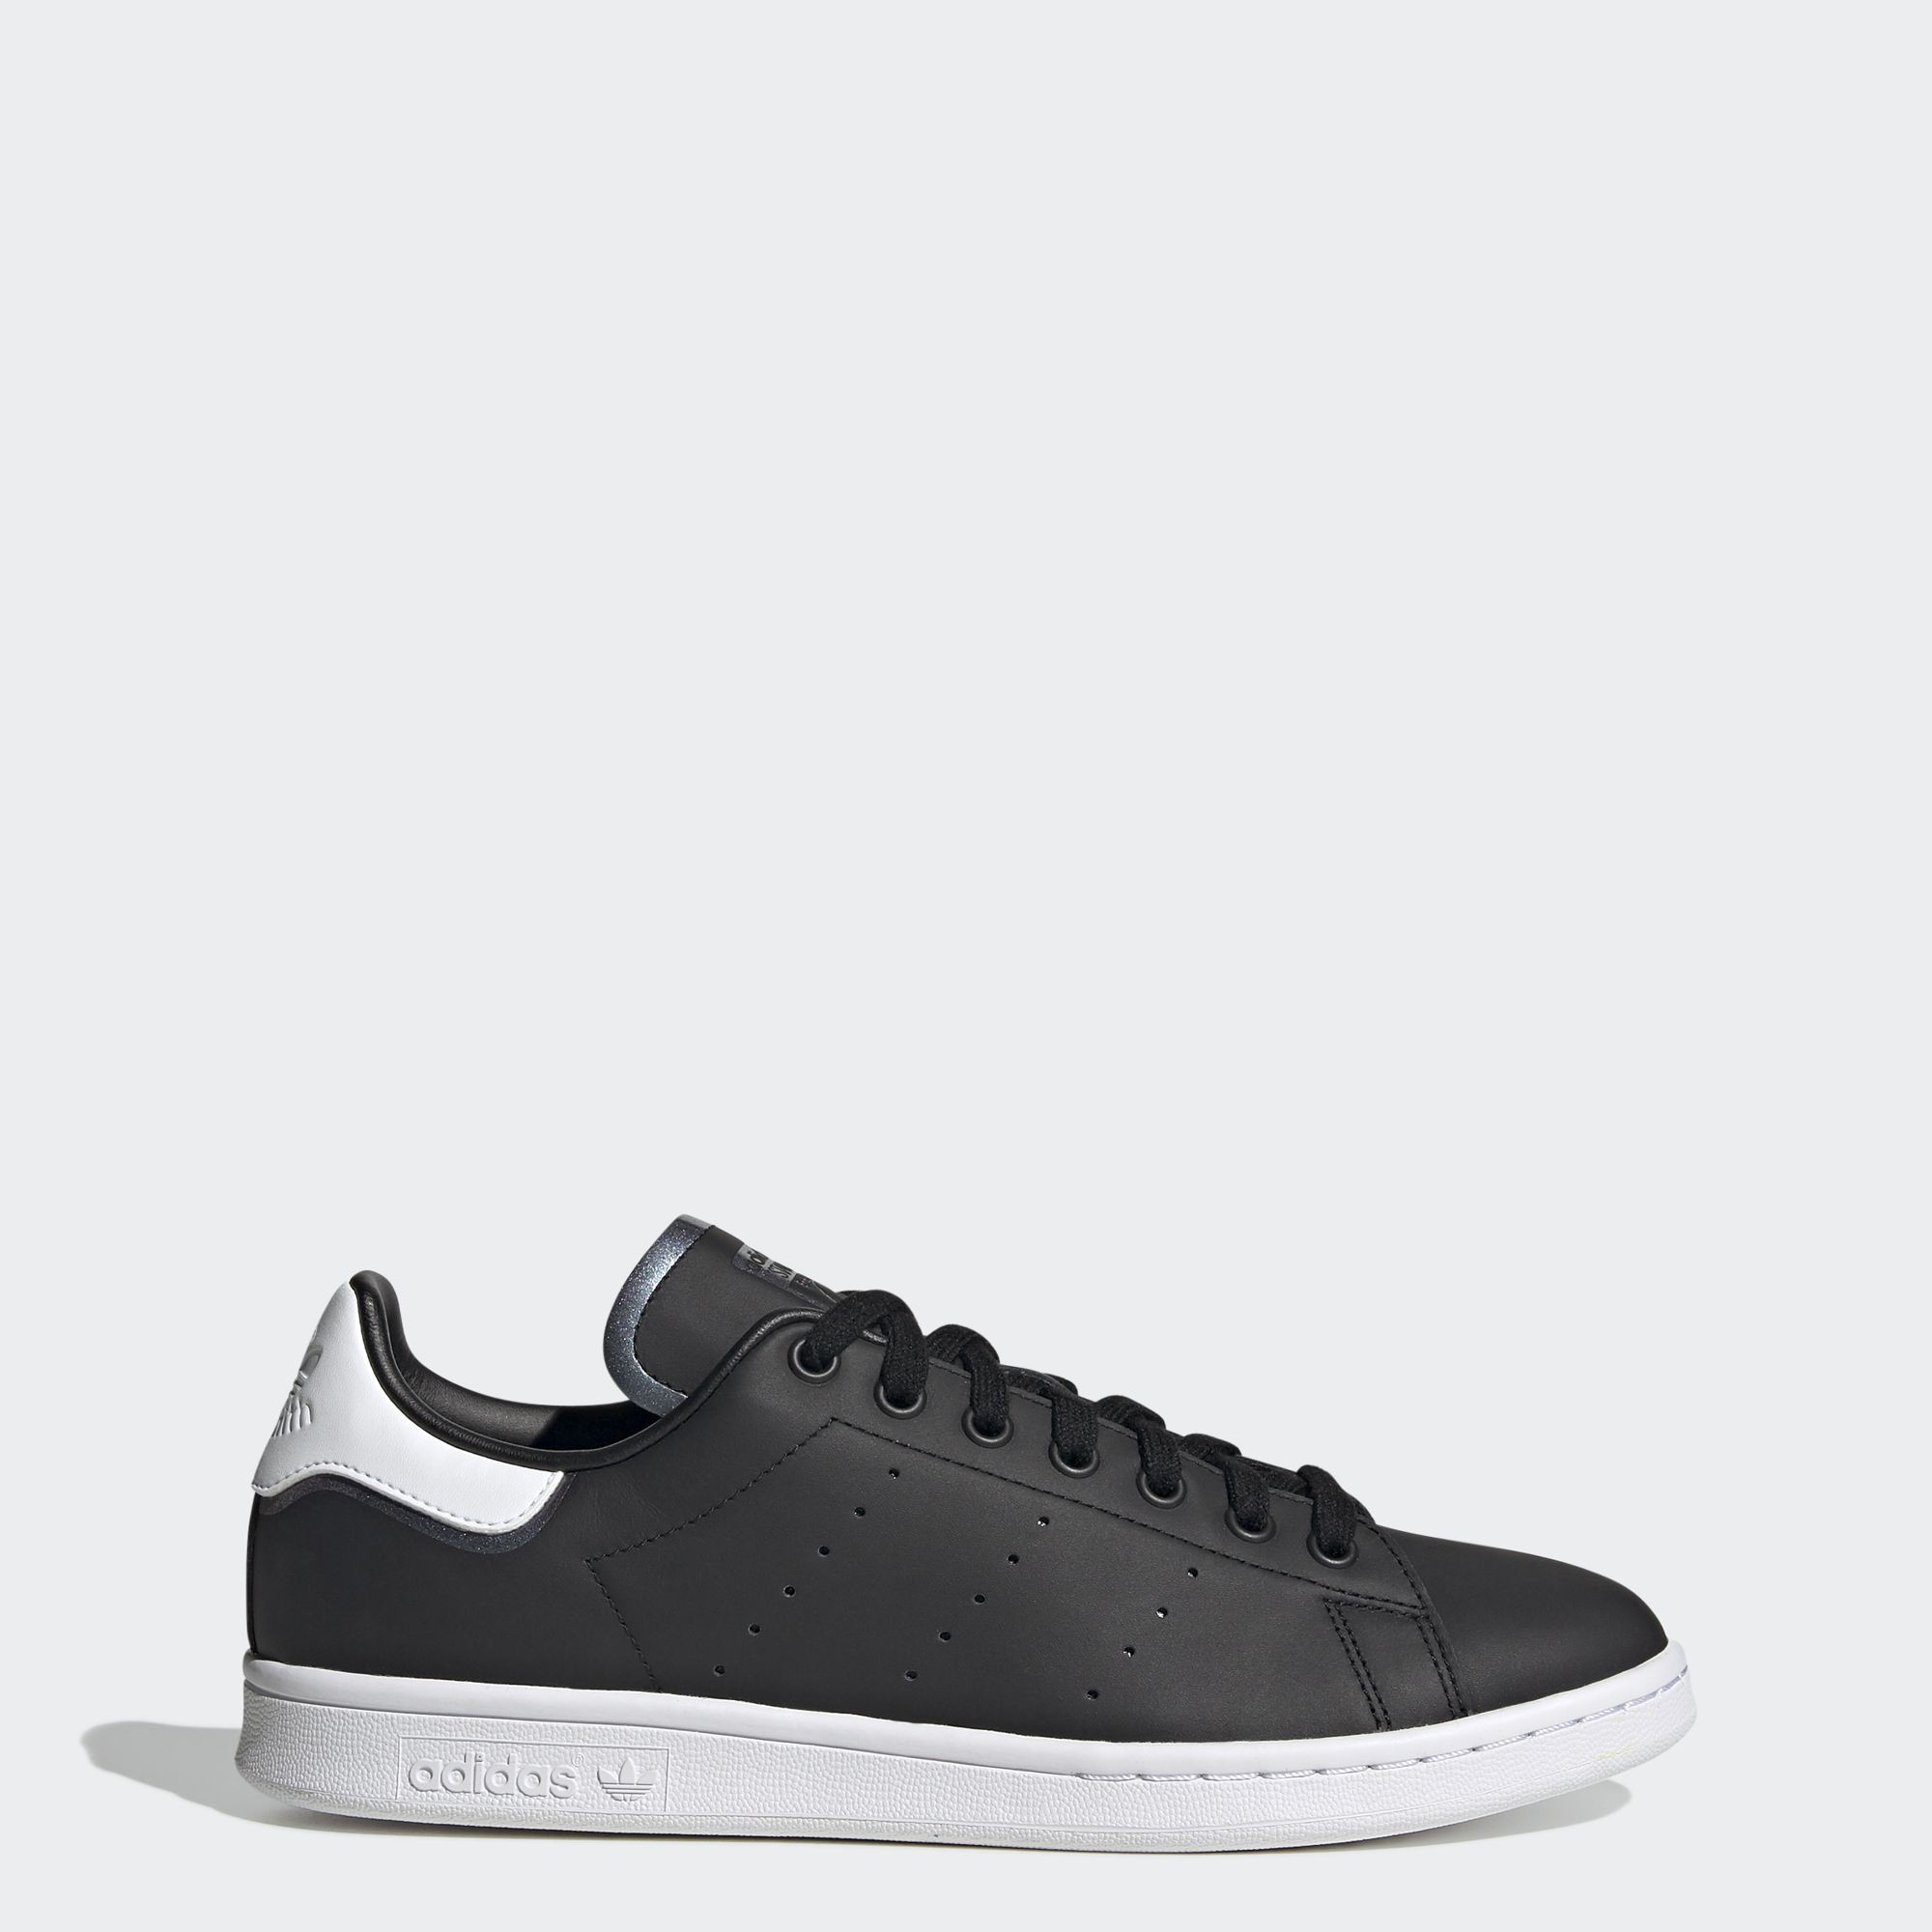 Giày adidas ORIGINALS Stan Smith Nam Màu đen FU9614